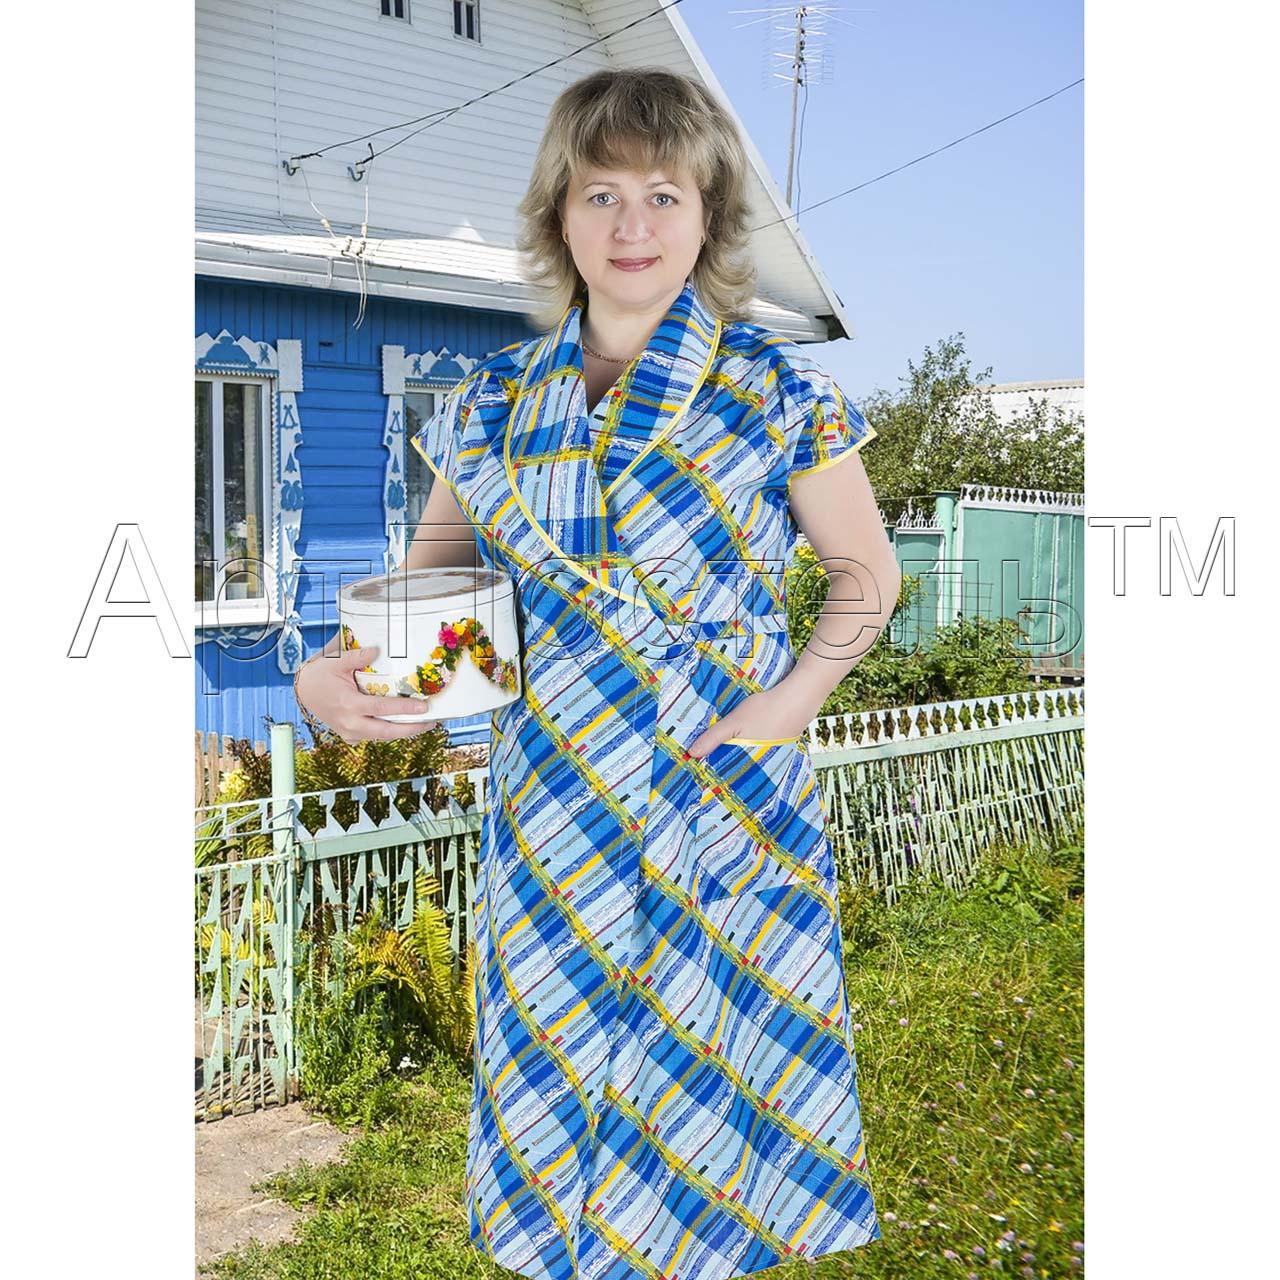 Женский халат Арлекин запашной, размер 52Халаты<br>Обхват груди:104 см<br>Обхват талии:86 см<br>Обхват бедер:112 см<br>Рост:164-170 см<br><br>Тип: Жен. халат<br>Размер: 52<br>Материал: Бязь